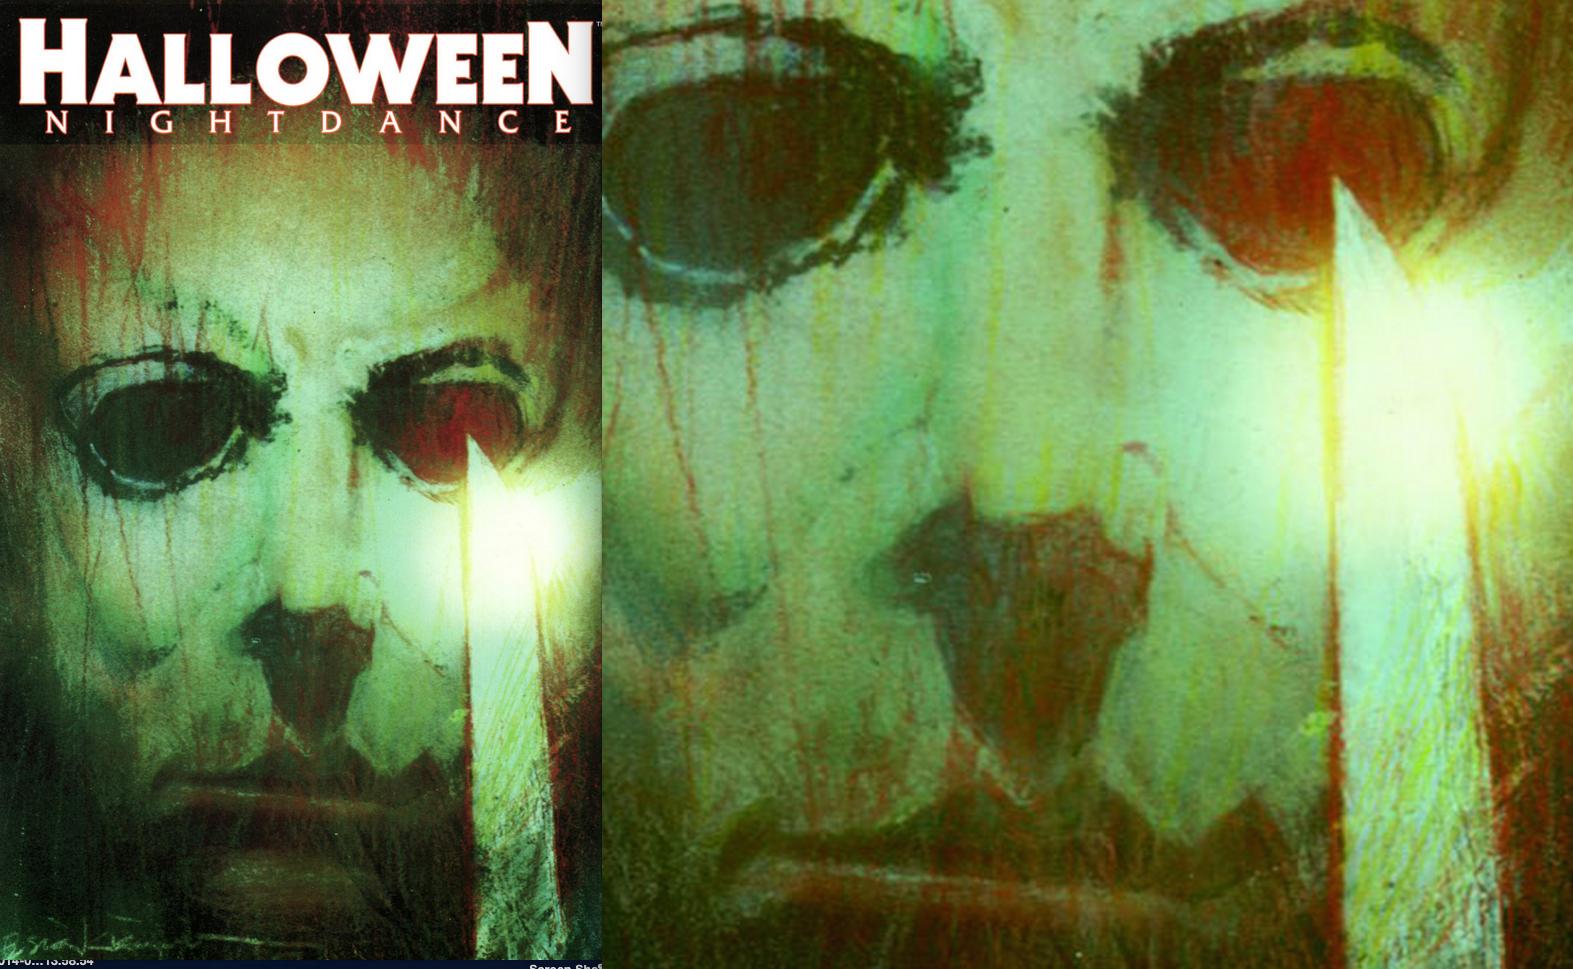 Halloween Nightdance 1 Cover Variant